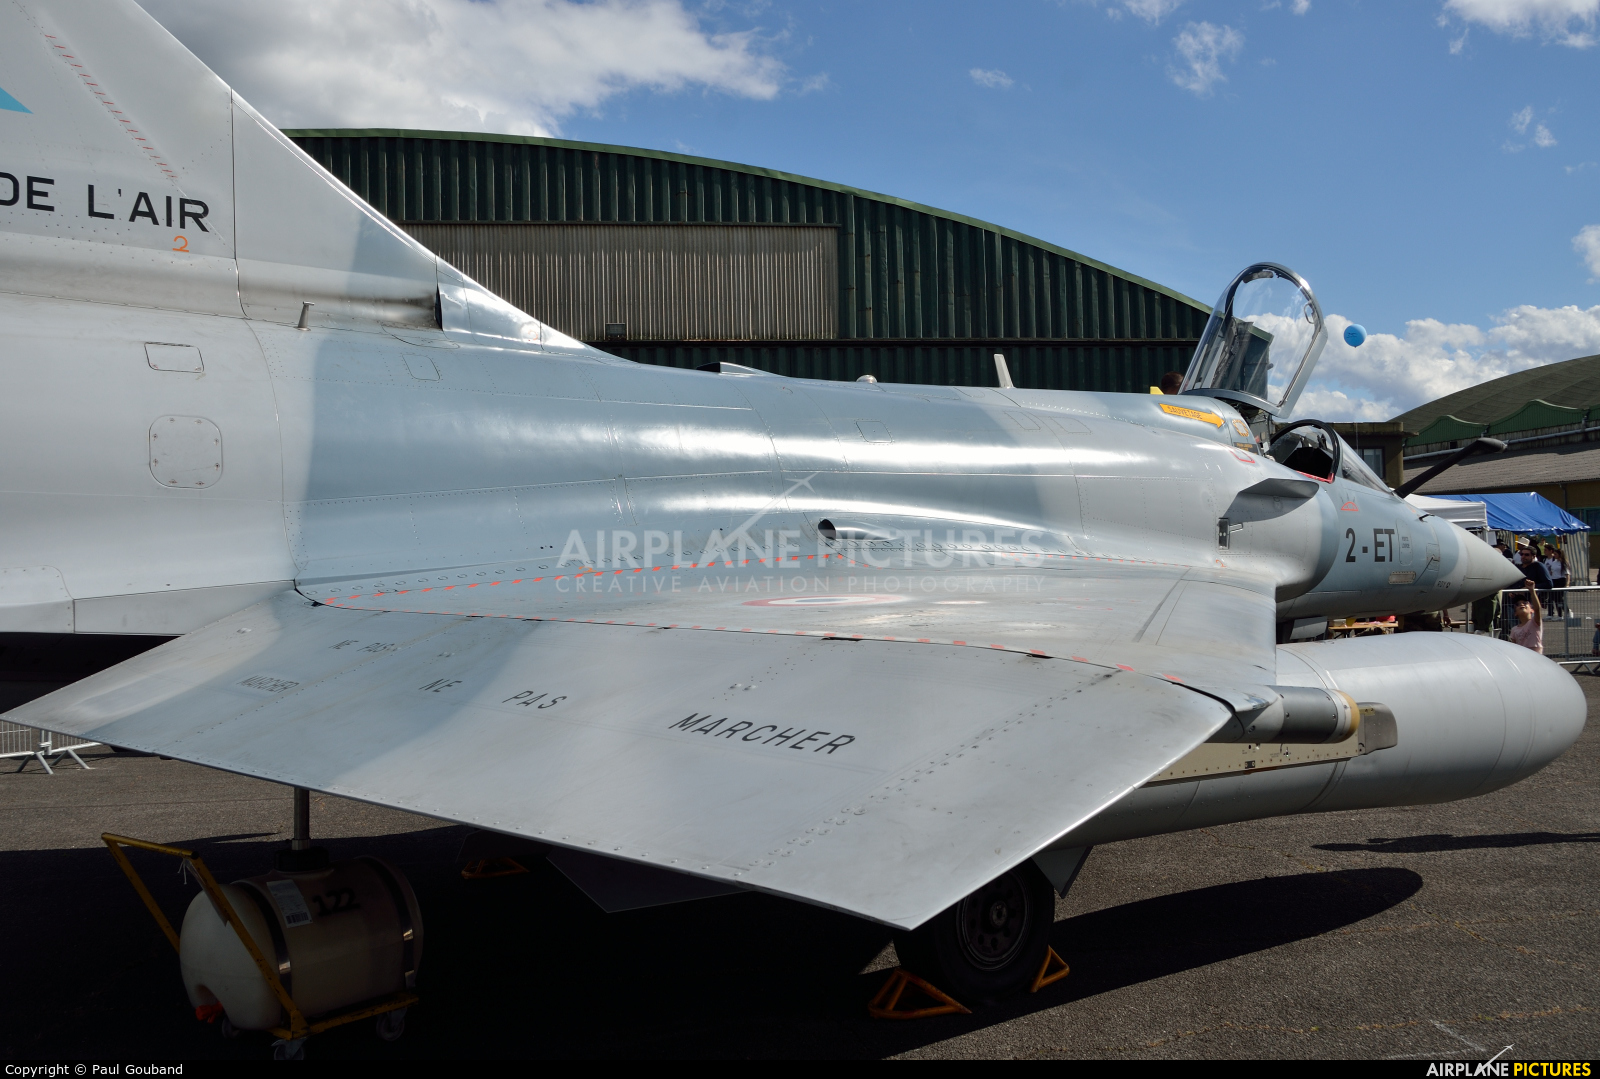 France - Air Force 2-ET aircraft at Bordeaux - Merignac